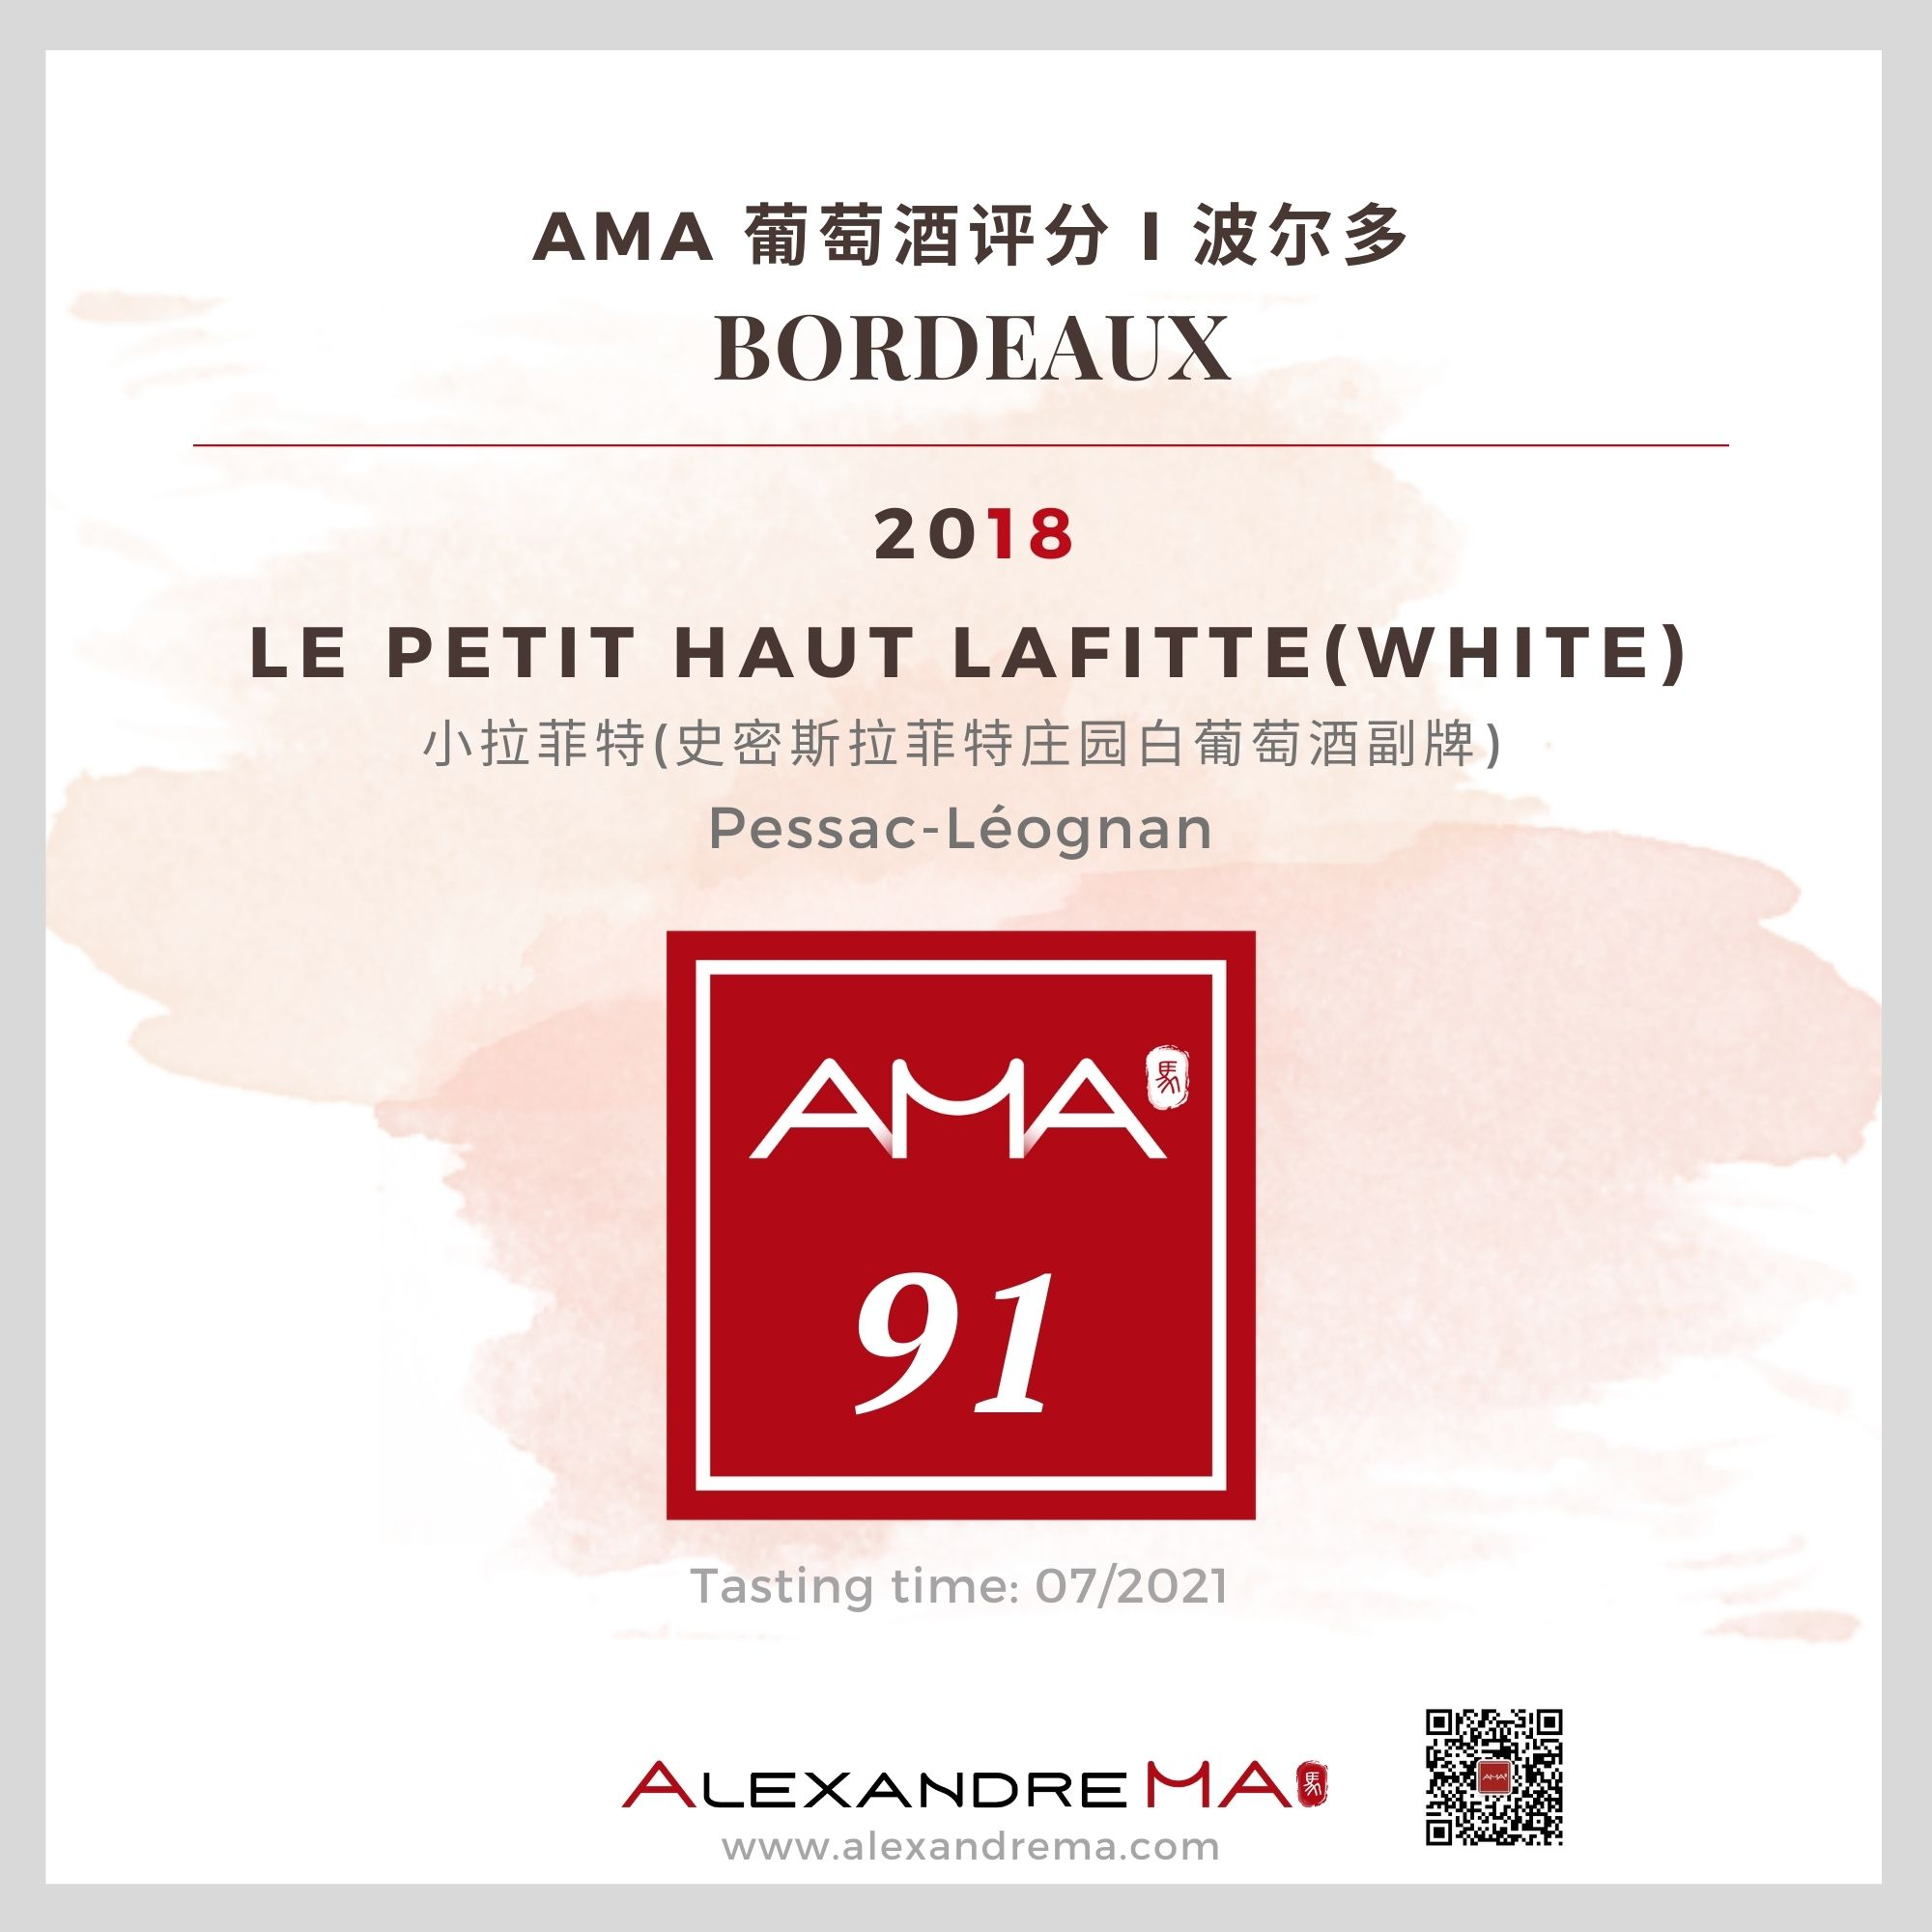 Château Smith Haut Lafitte – Le Petit Haut Lafitte White 2018 小拉菲特 - Alexandre Ma